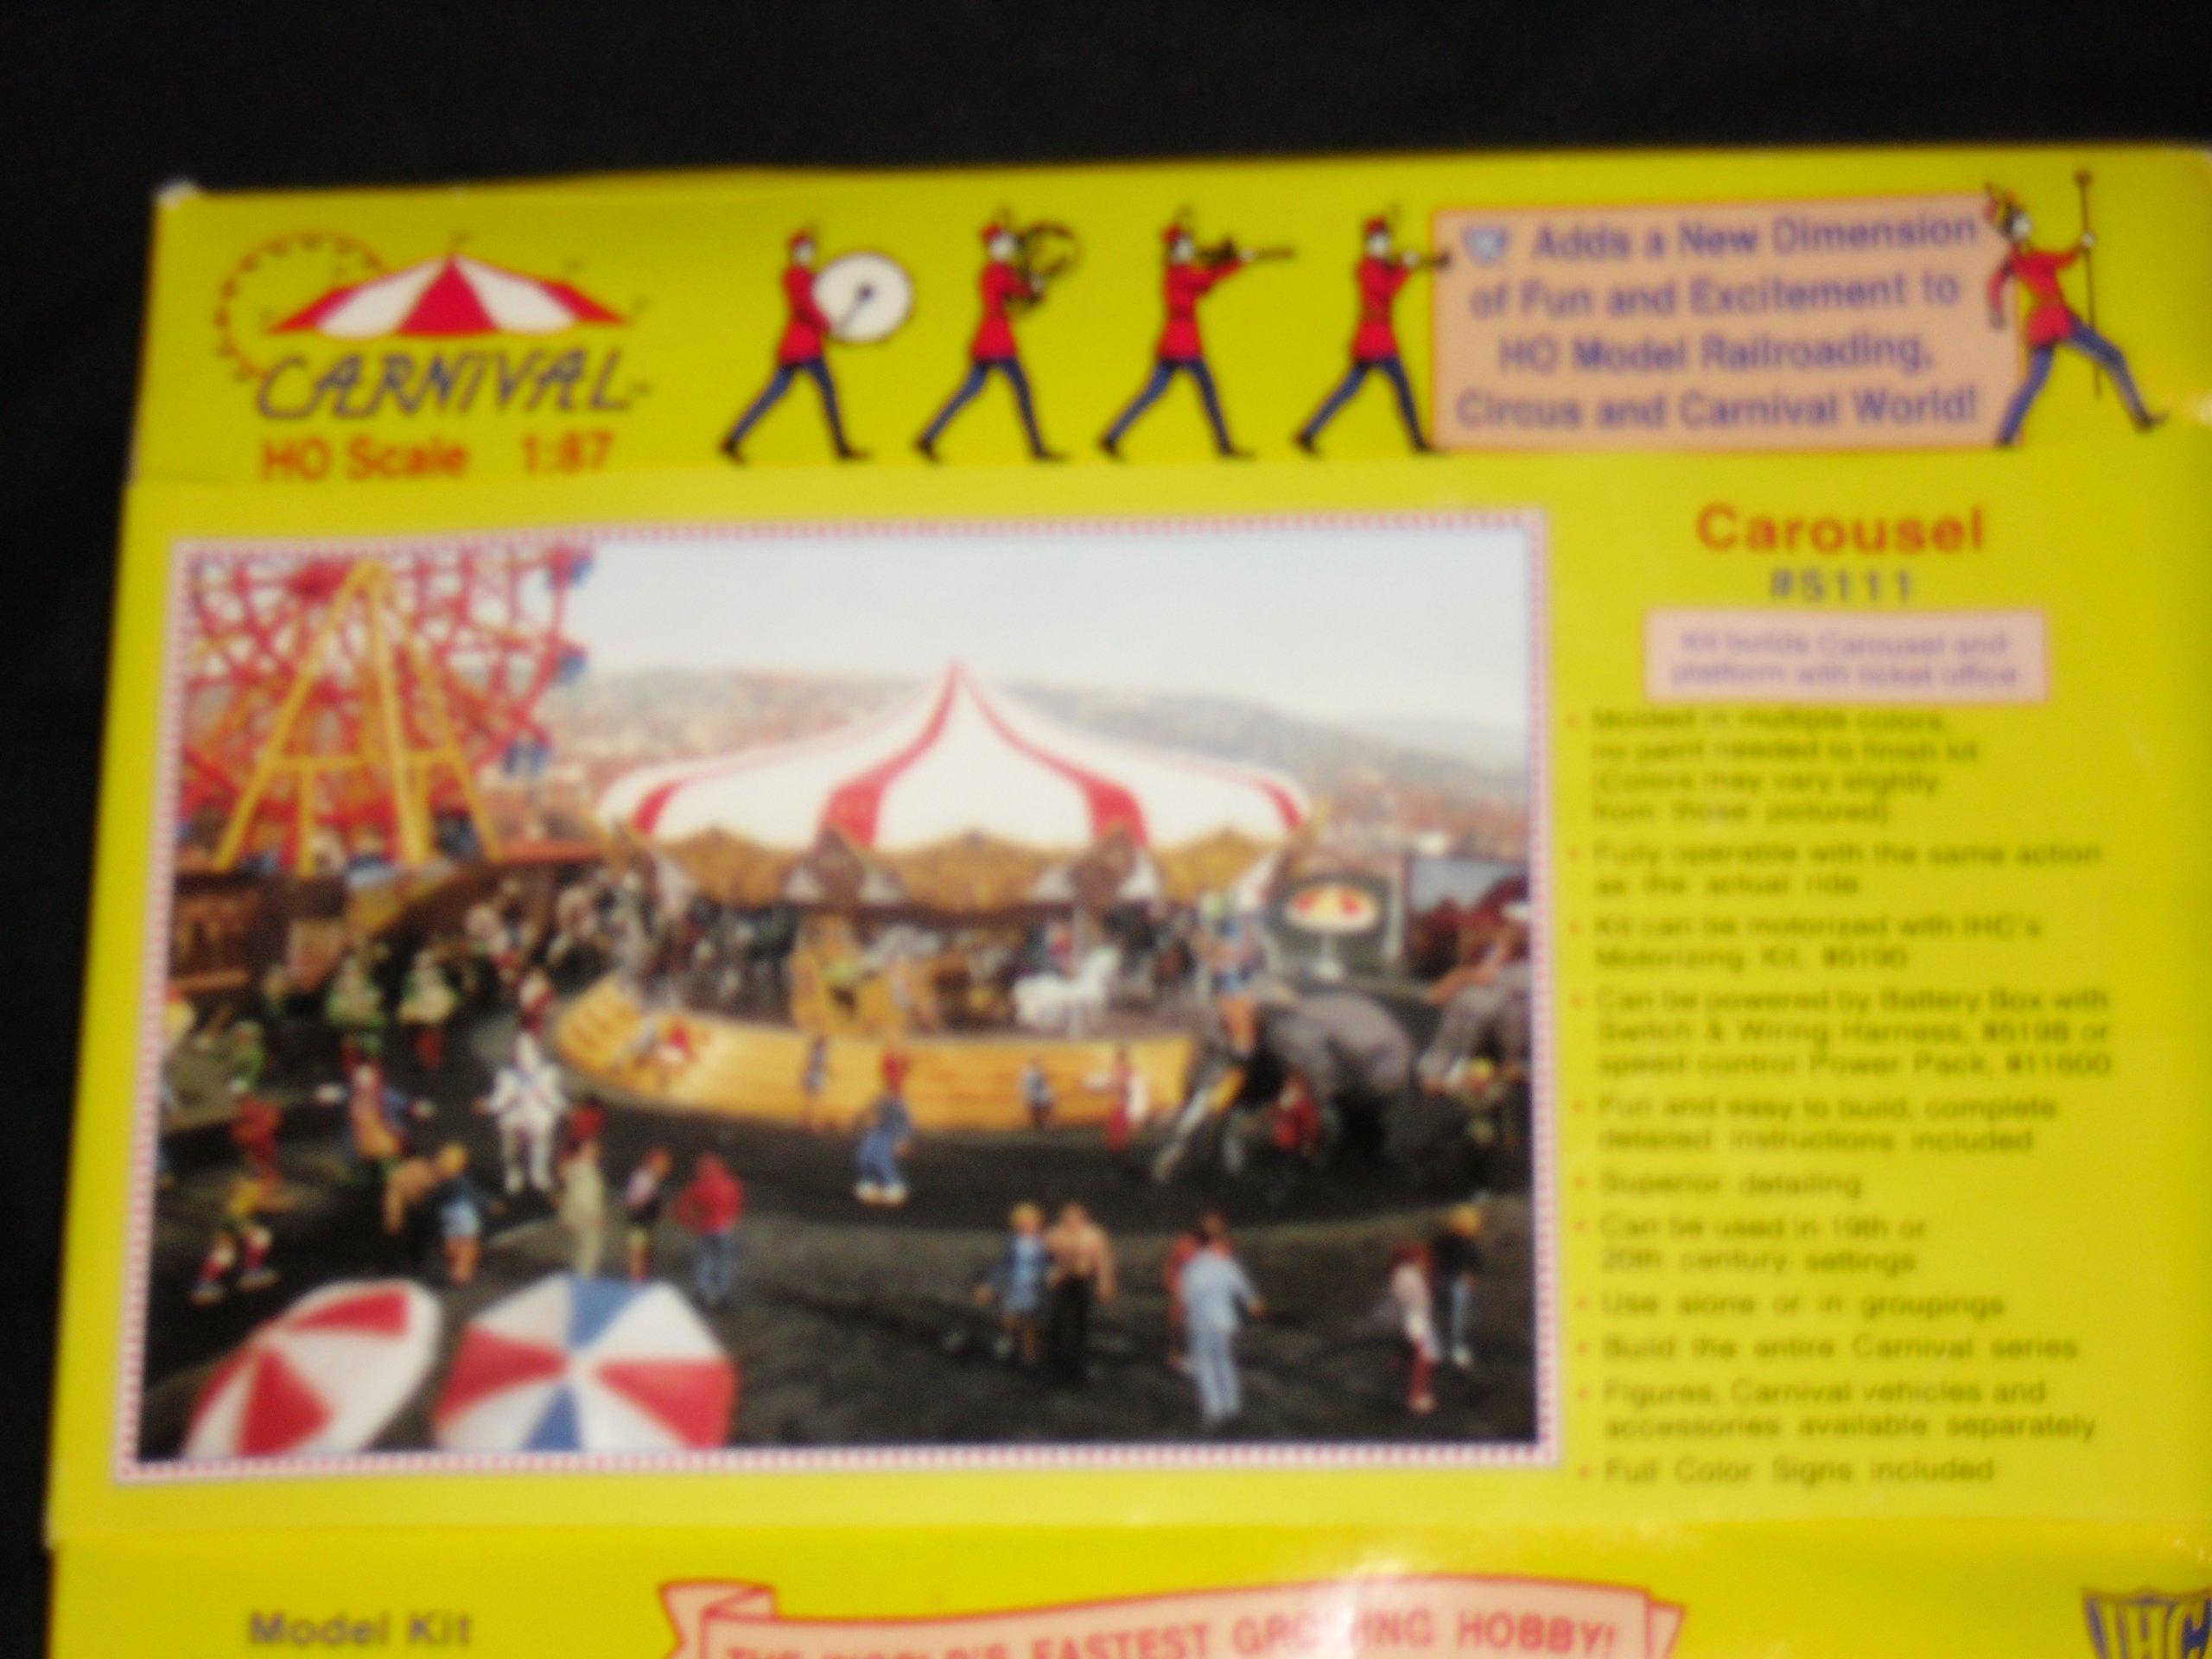 Carnival HO Scale 1:87